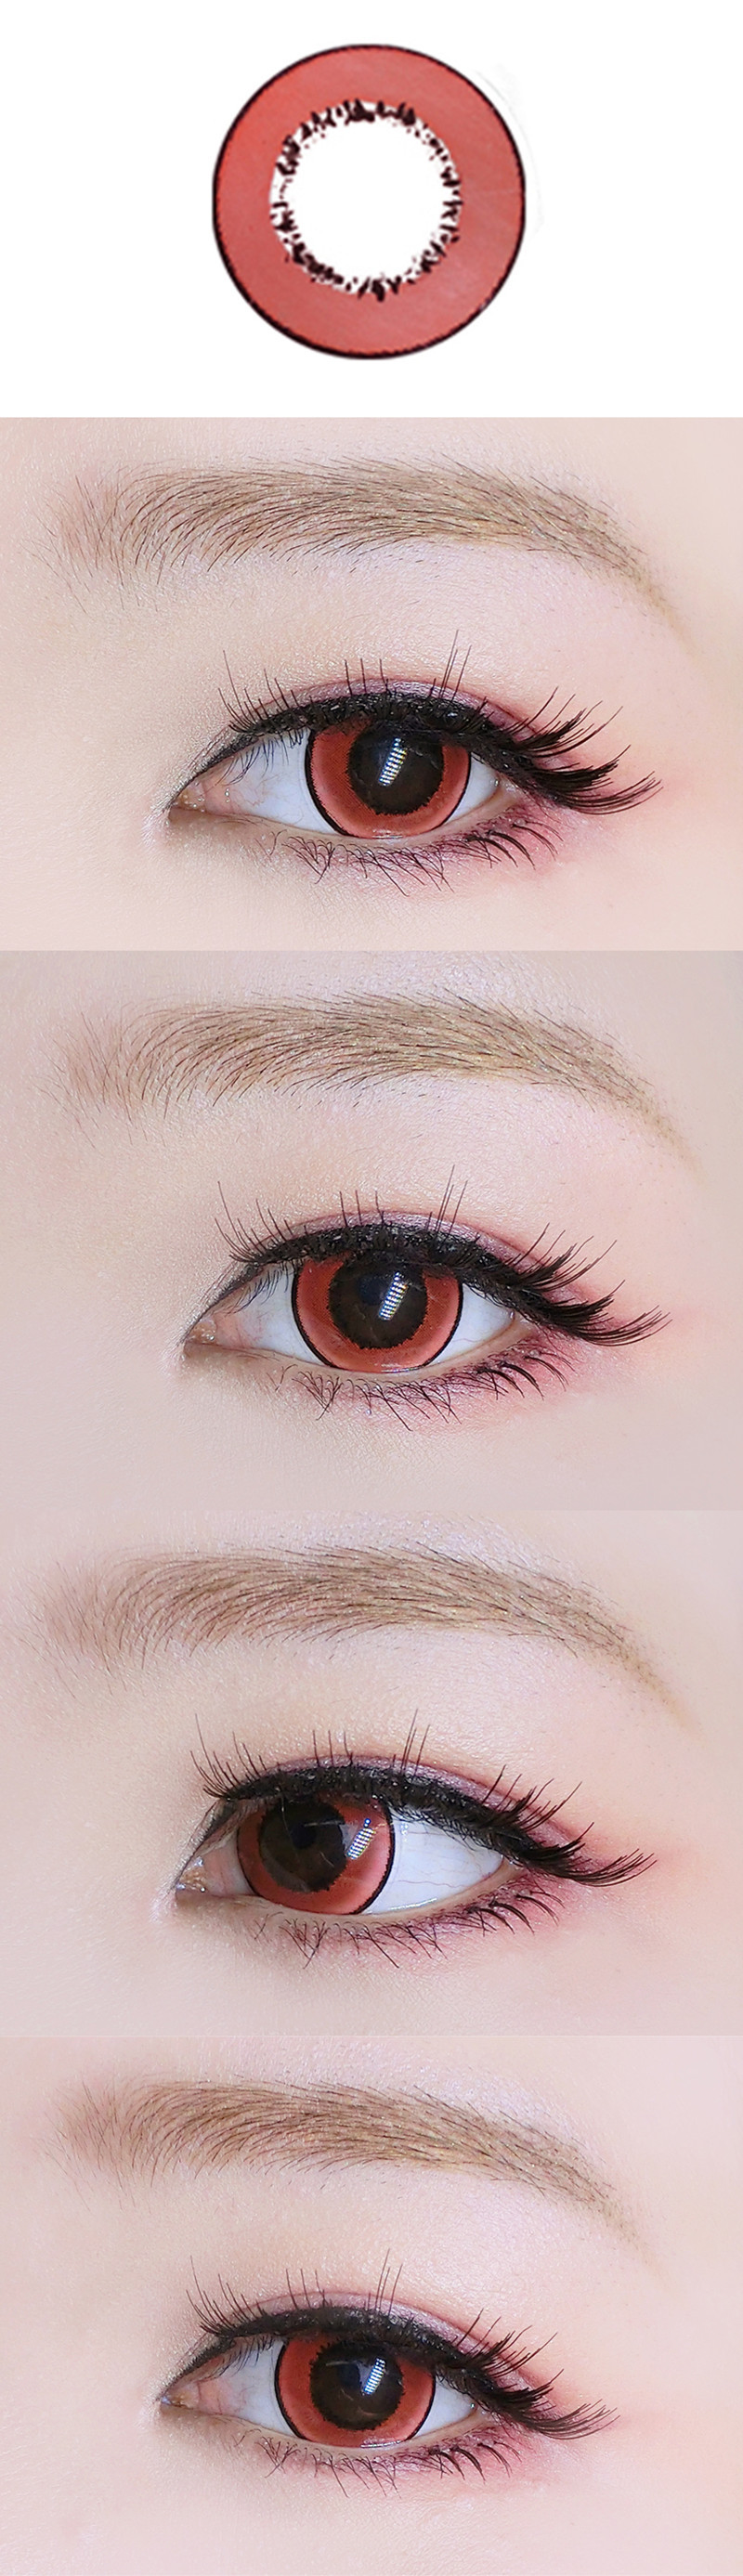 2014 19mm contact lenskorea color contact lensbarbie eye contact 2014 19mm contact lenskorea color contact lensbarbie eye contact lens nvjuhfo Image collections